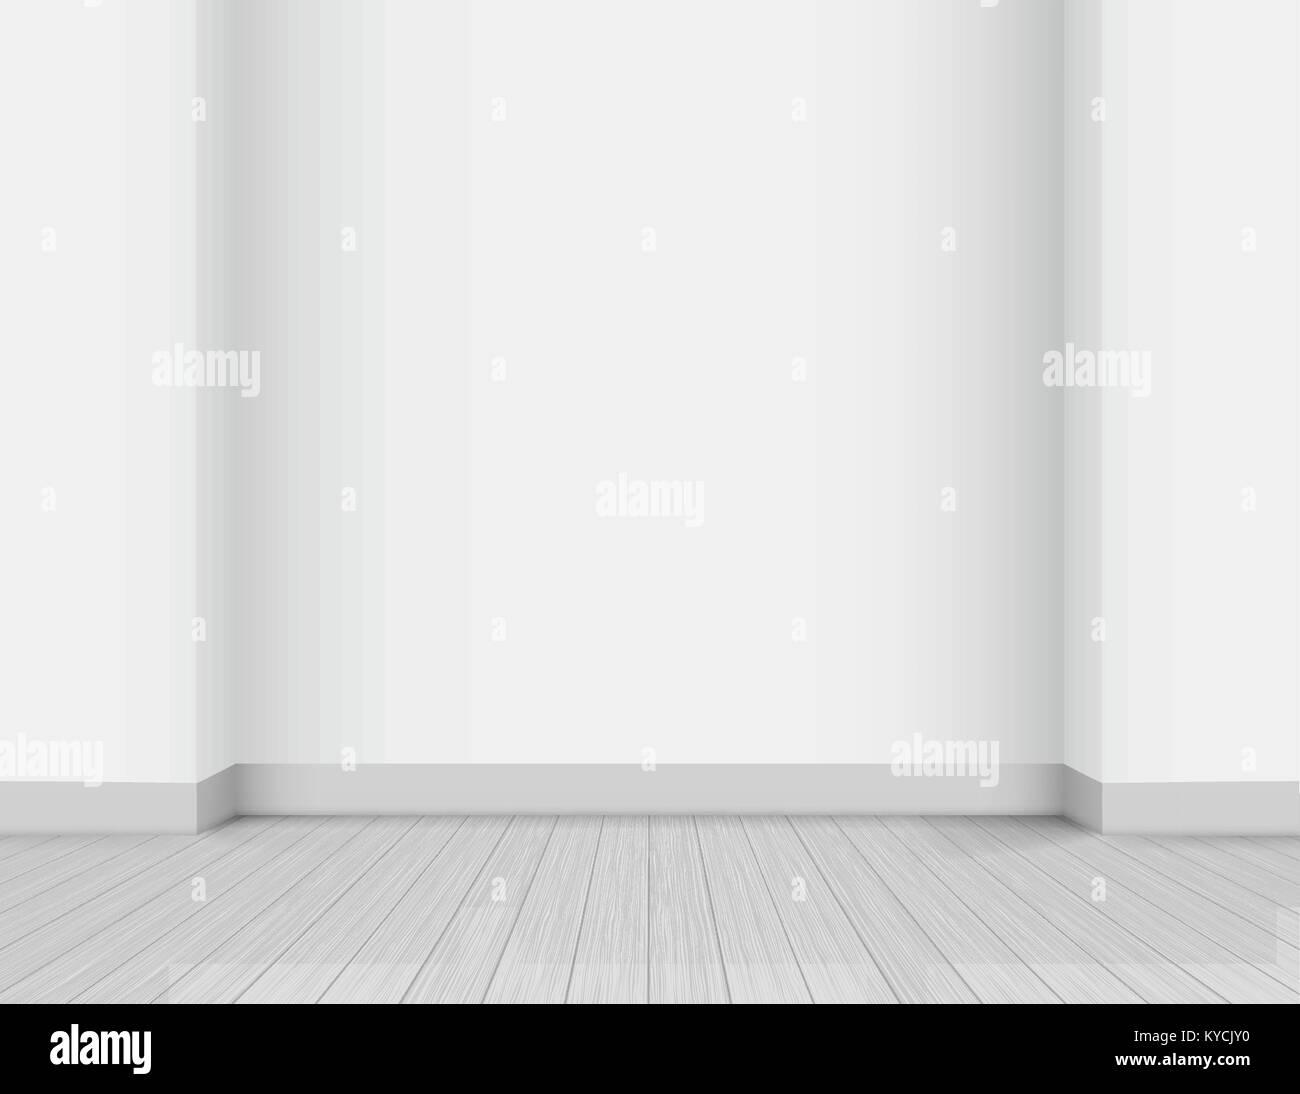 Studio wall background - Stock Vector